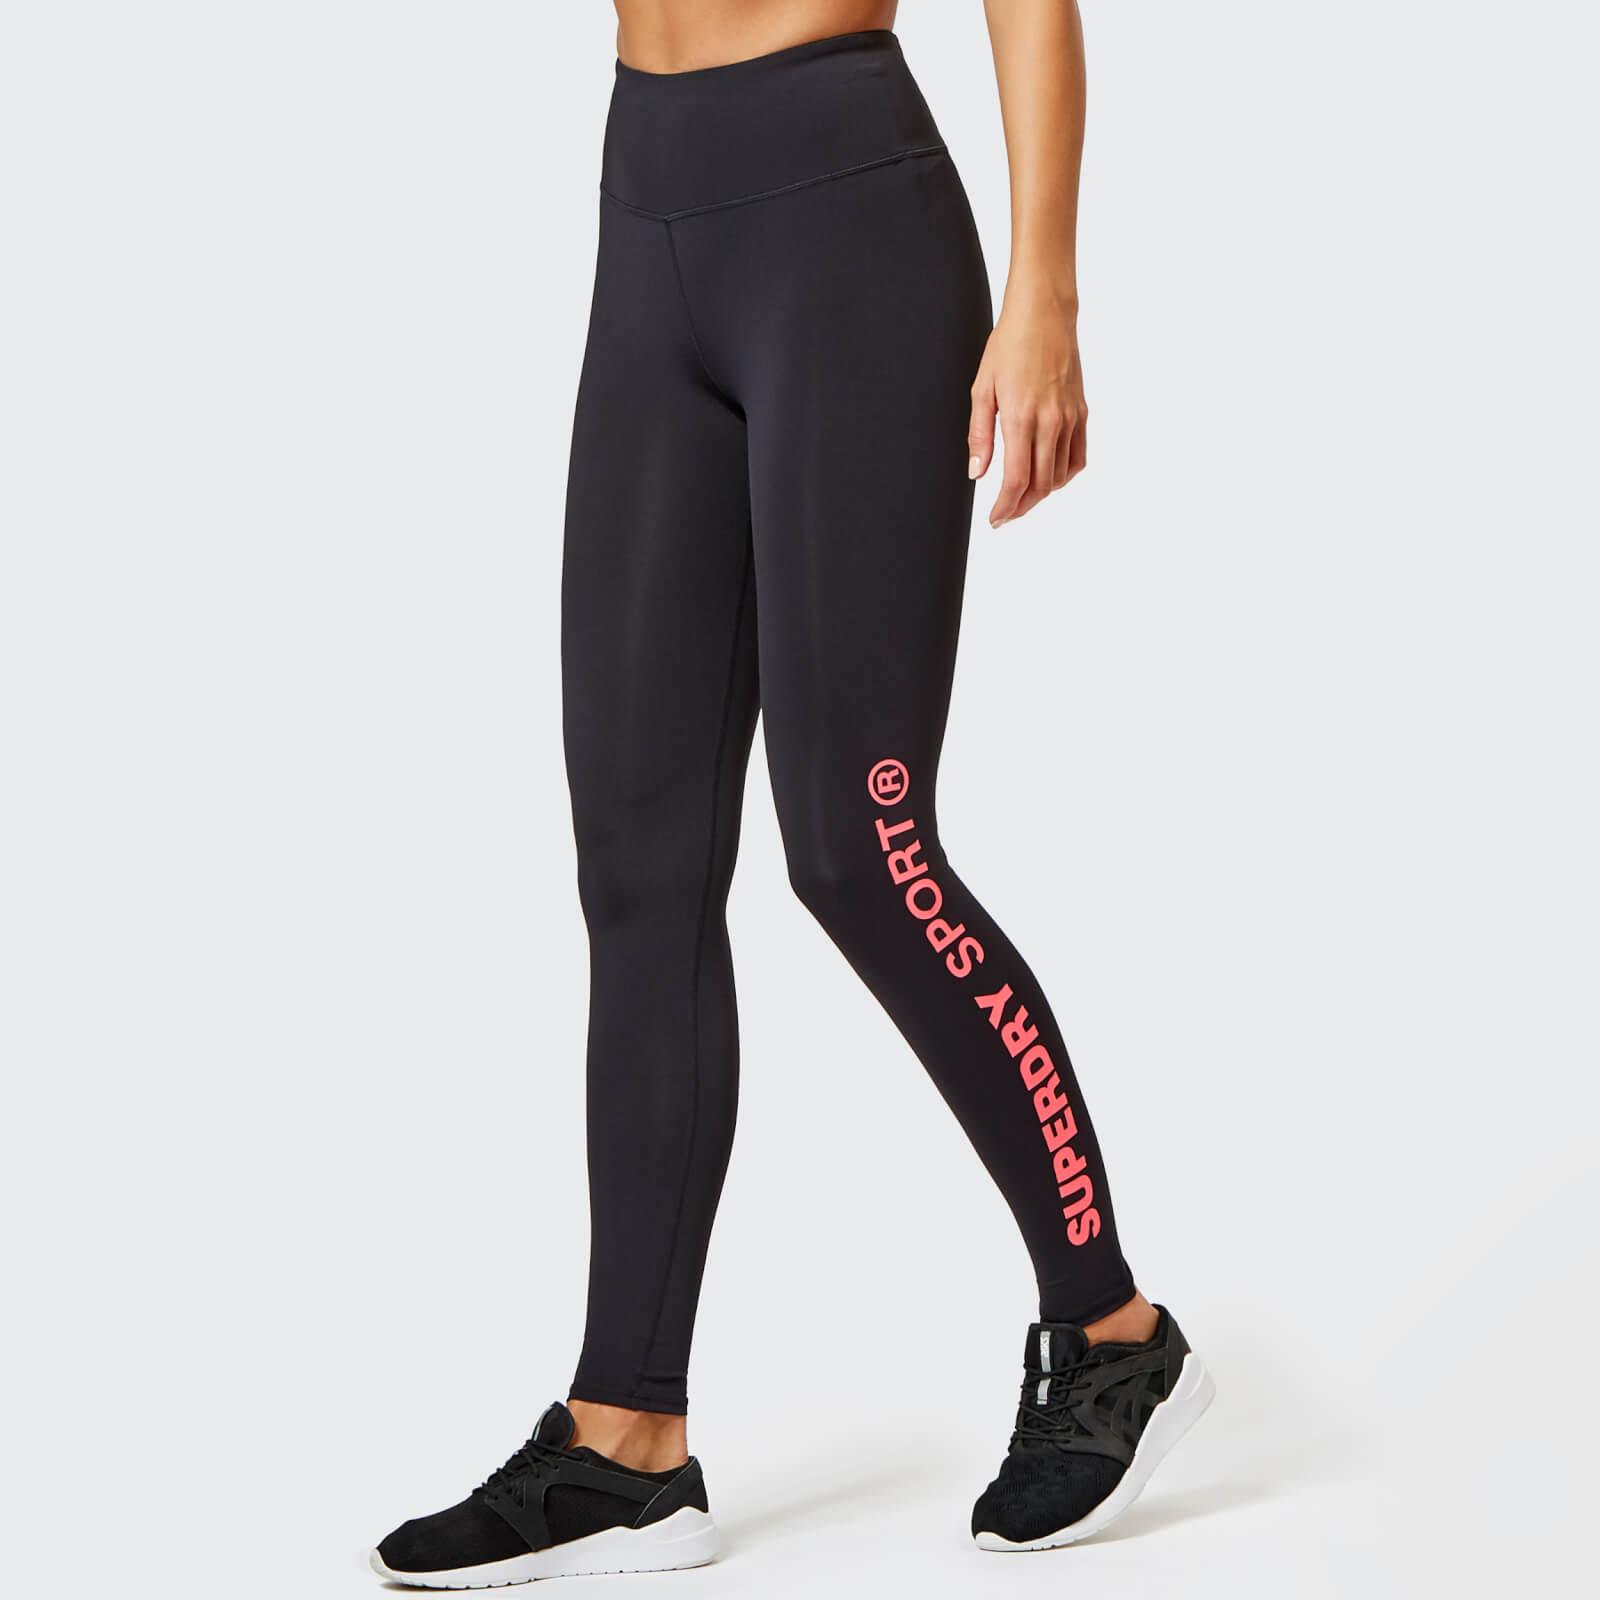 Leggings Women's Sport Superdry Core Womens Essential Black A4Rq5jc3L